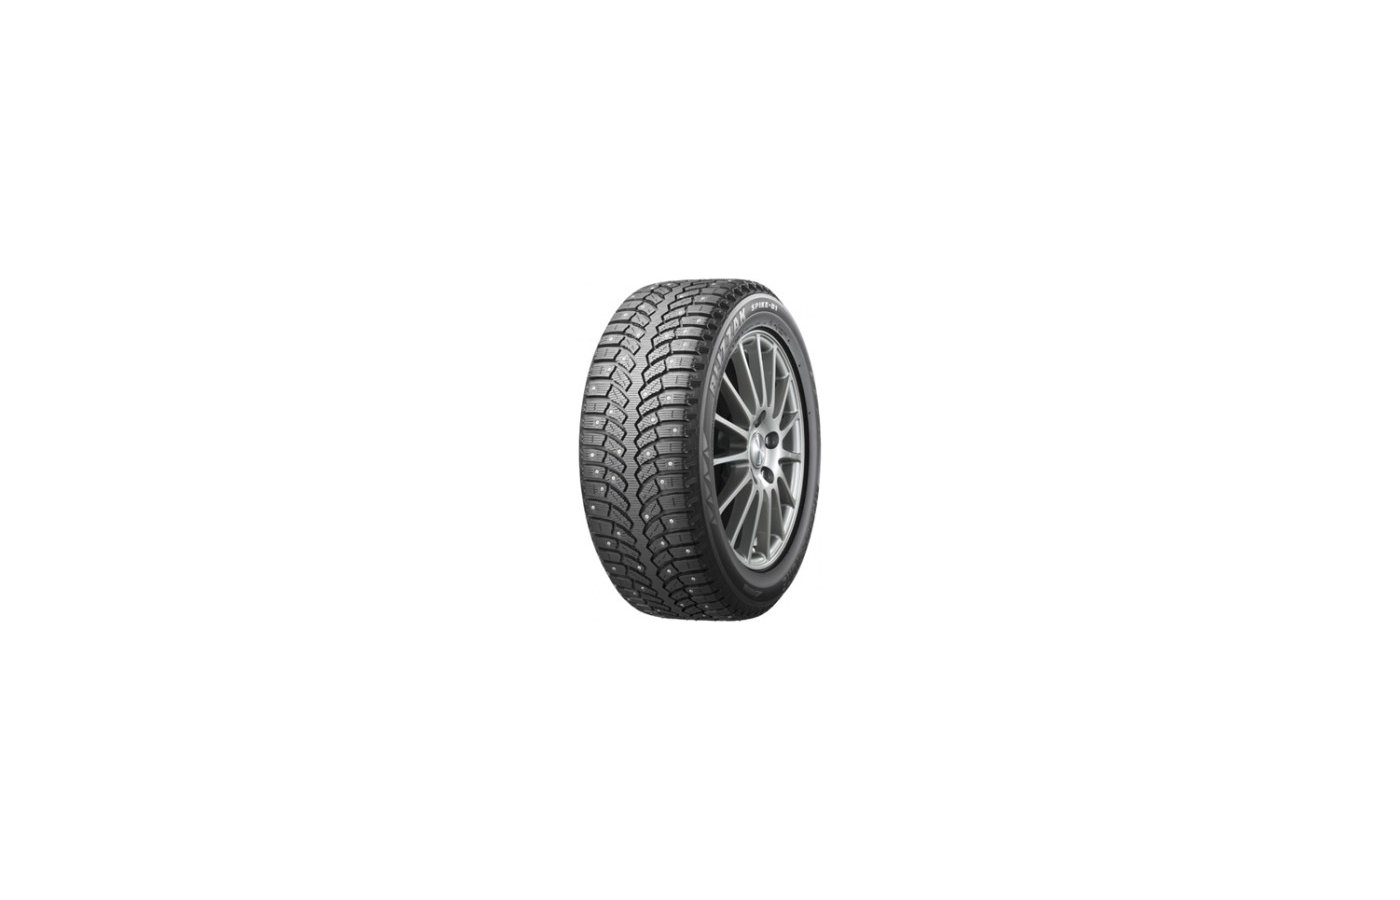 Шина Bridgestone Blizzak Spike-01 235/55 R17 TL 103T XL шип